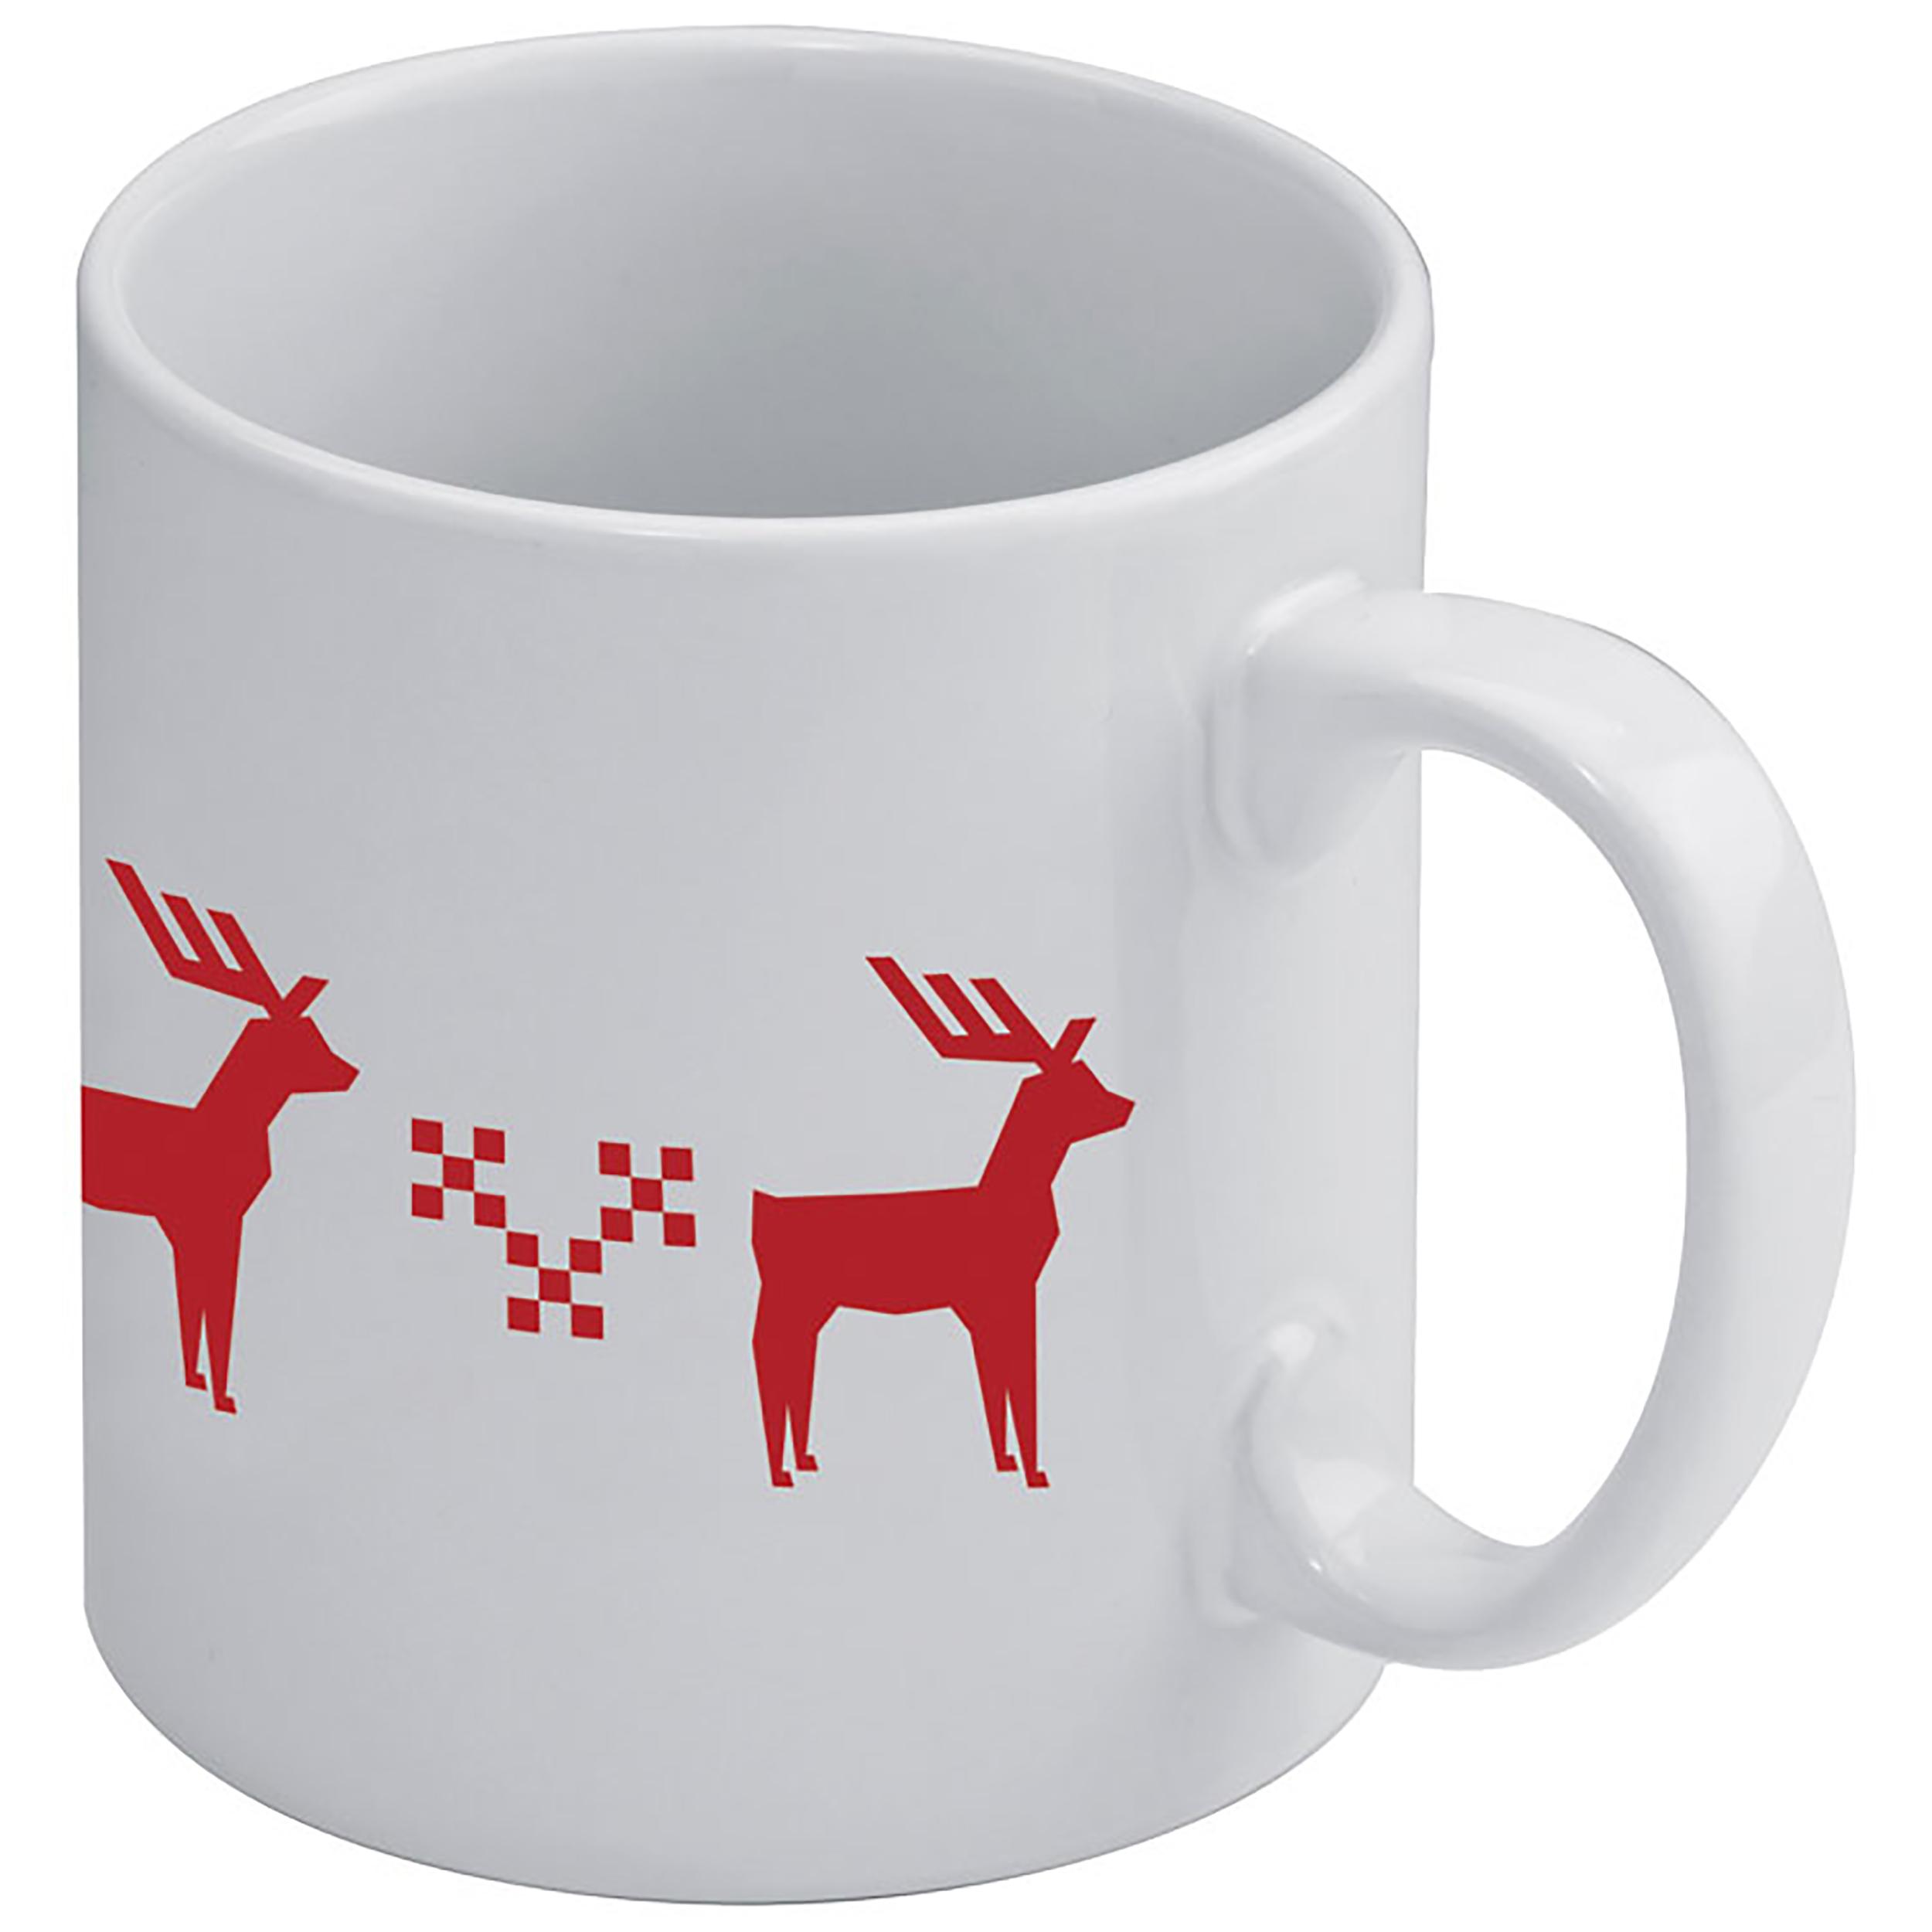 Ceramic coffeemug